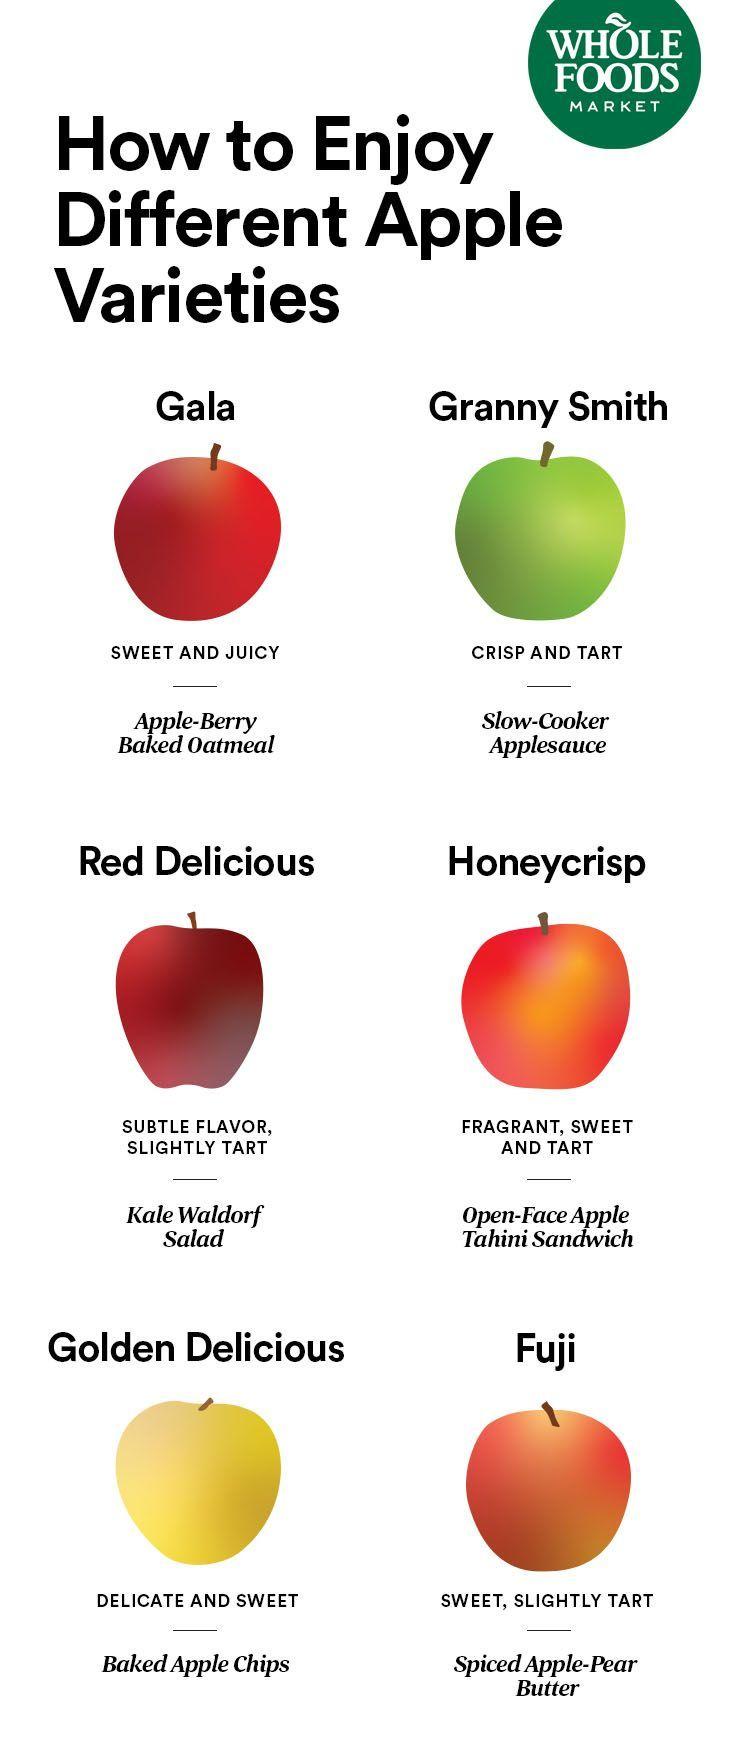 How to Enjoy Different Apple Varieties